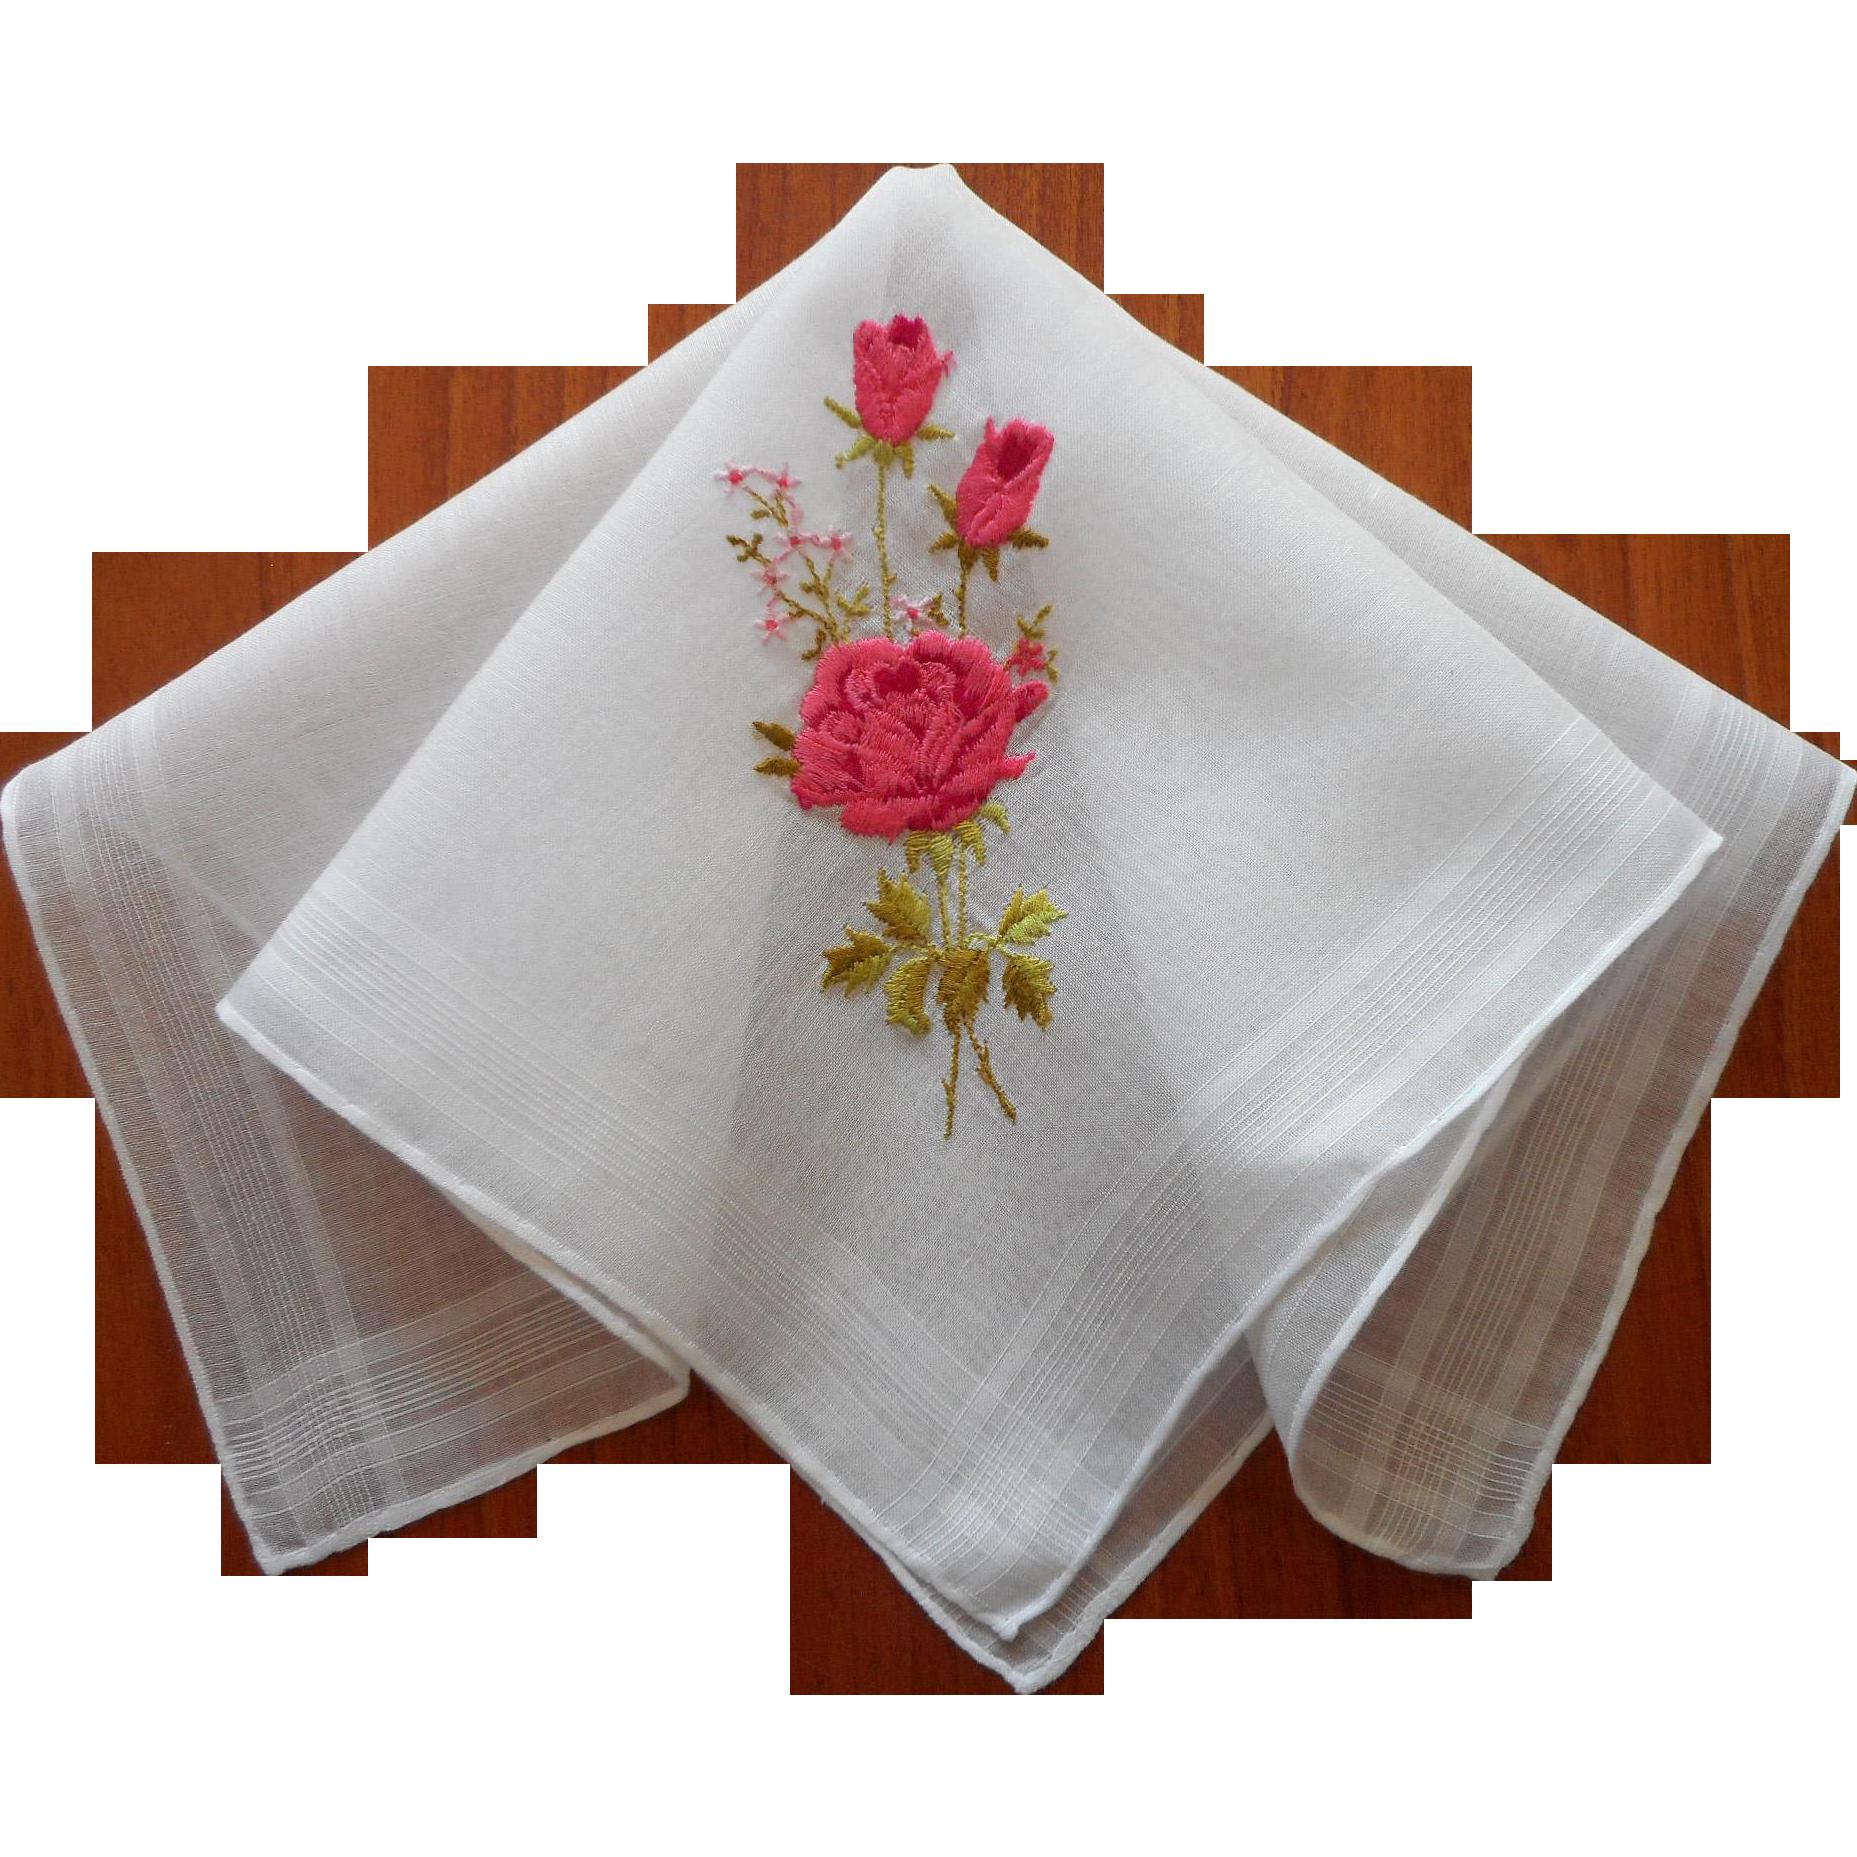 Vintage hankie pink roses. Napkin clipart handkerchief